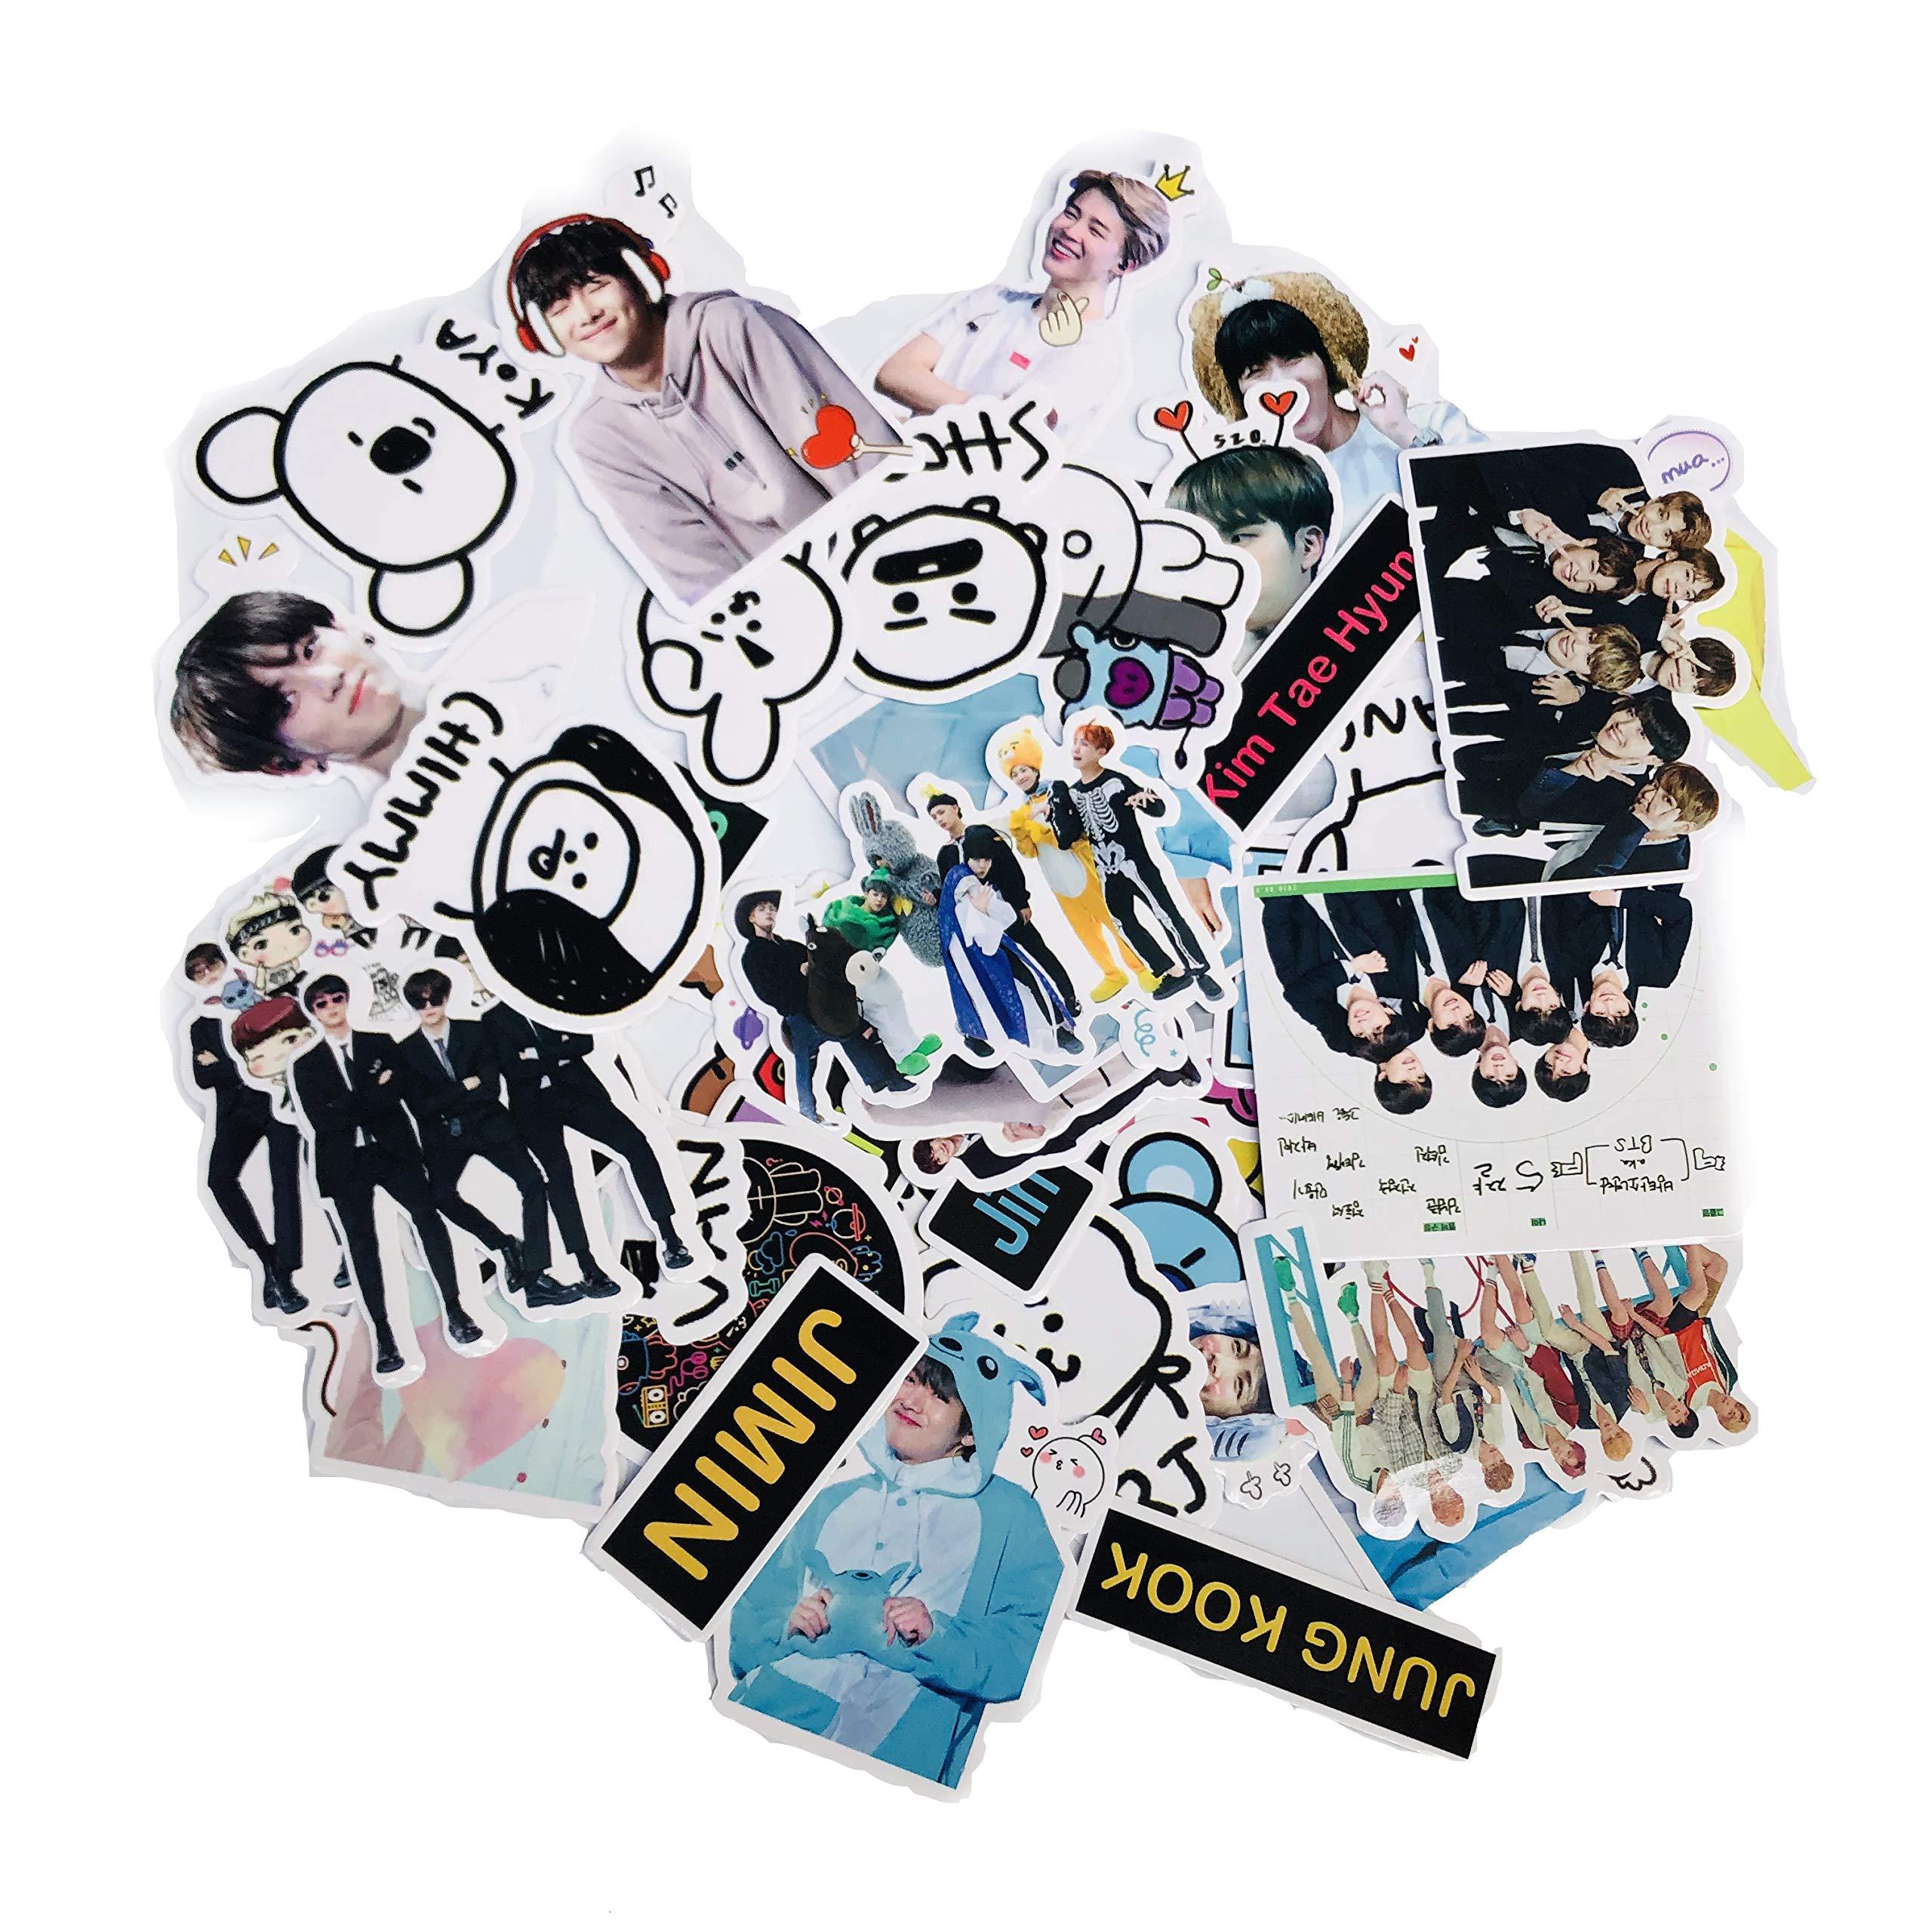 Stickers Calcos 53 Un. Kpop Bts Origen U.s.a. (7mdglhsj)